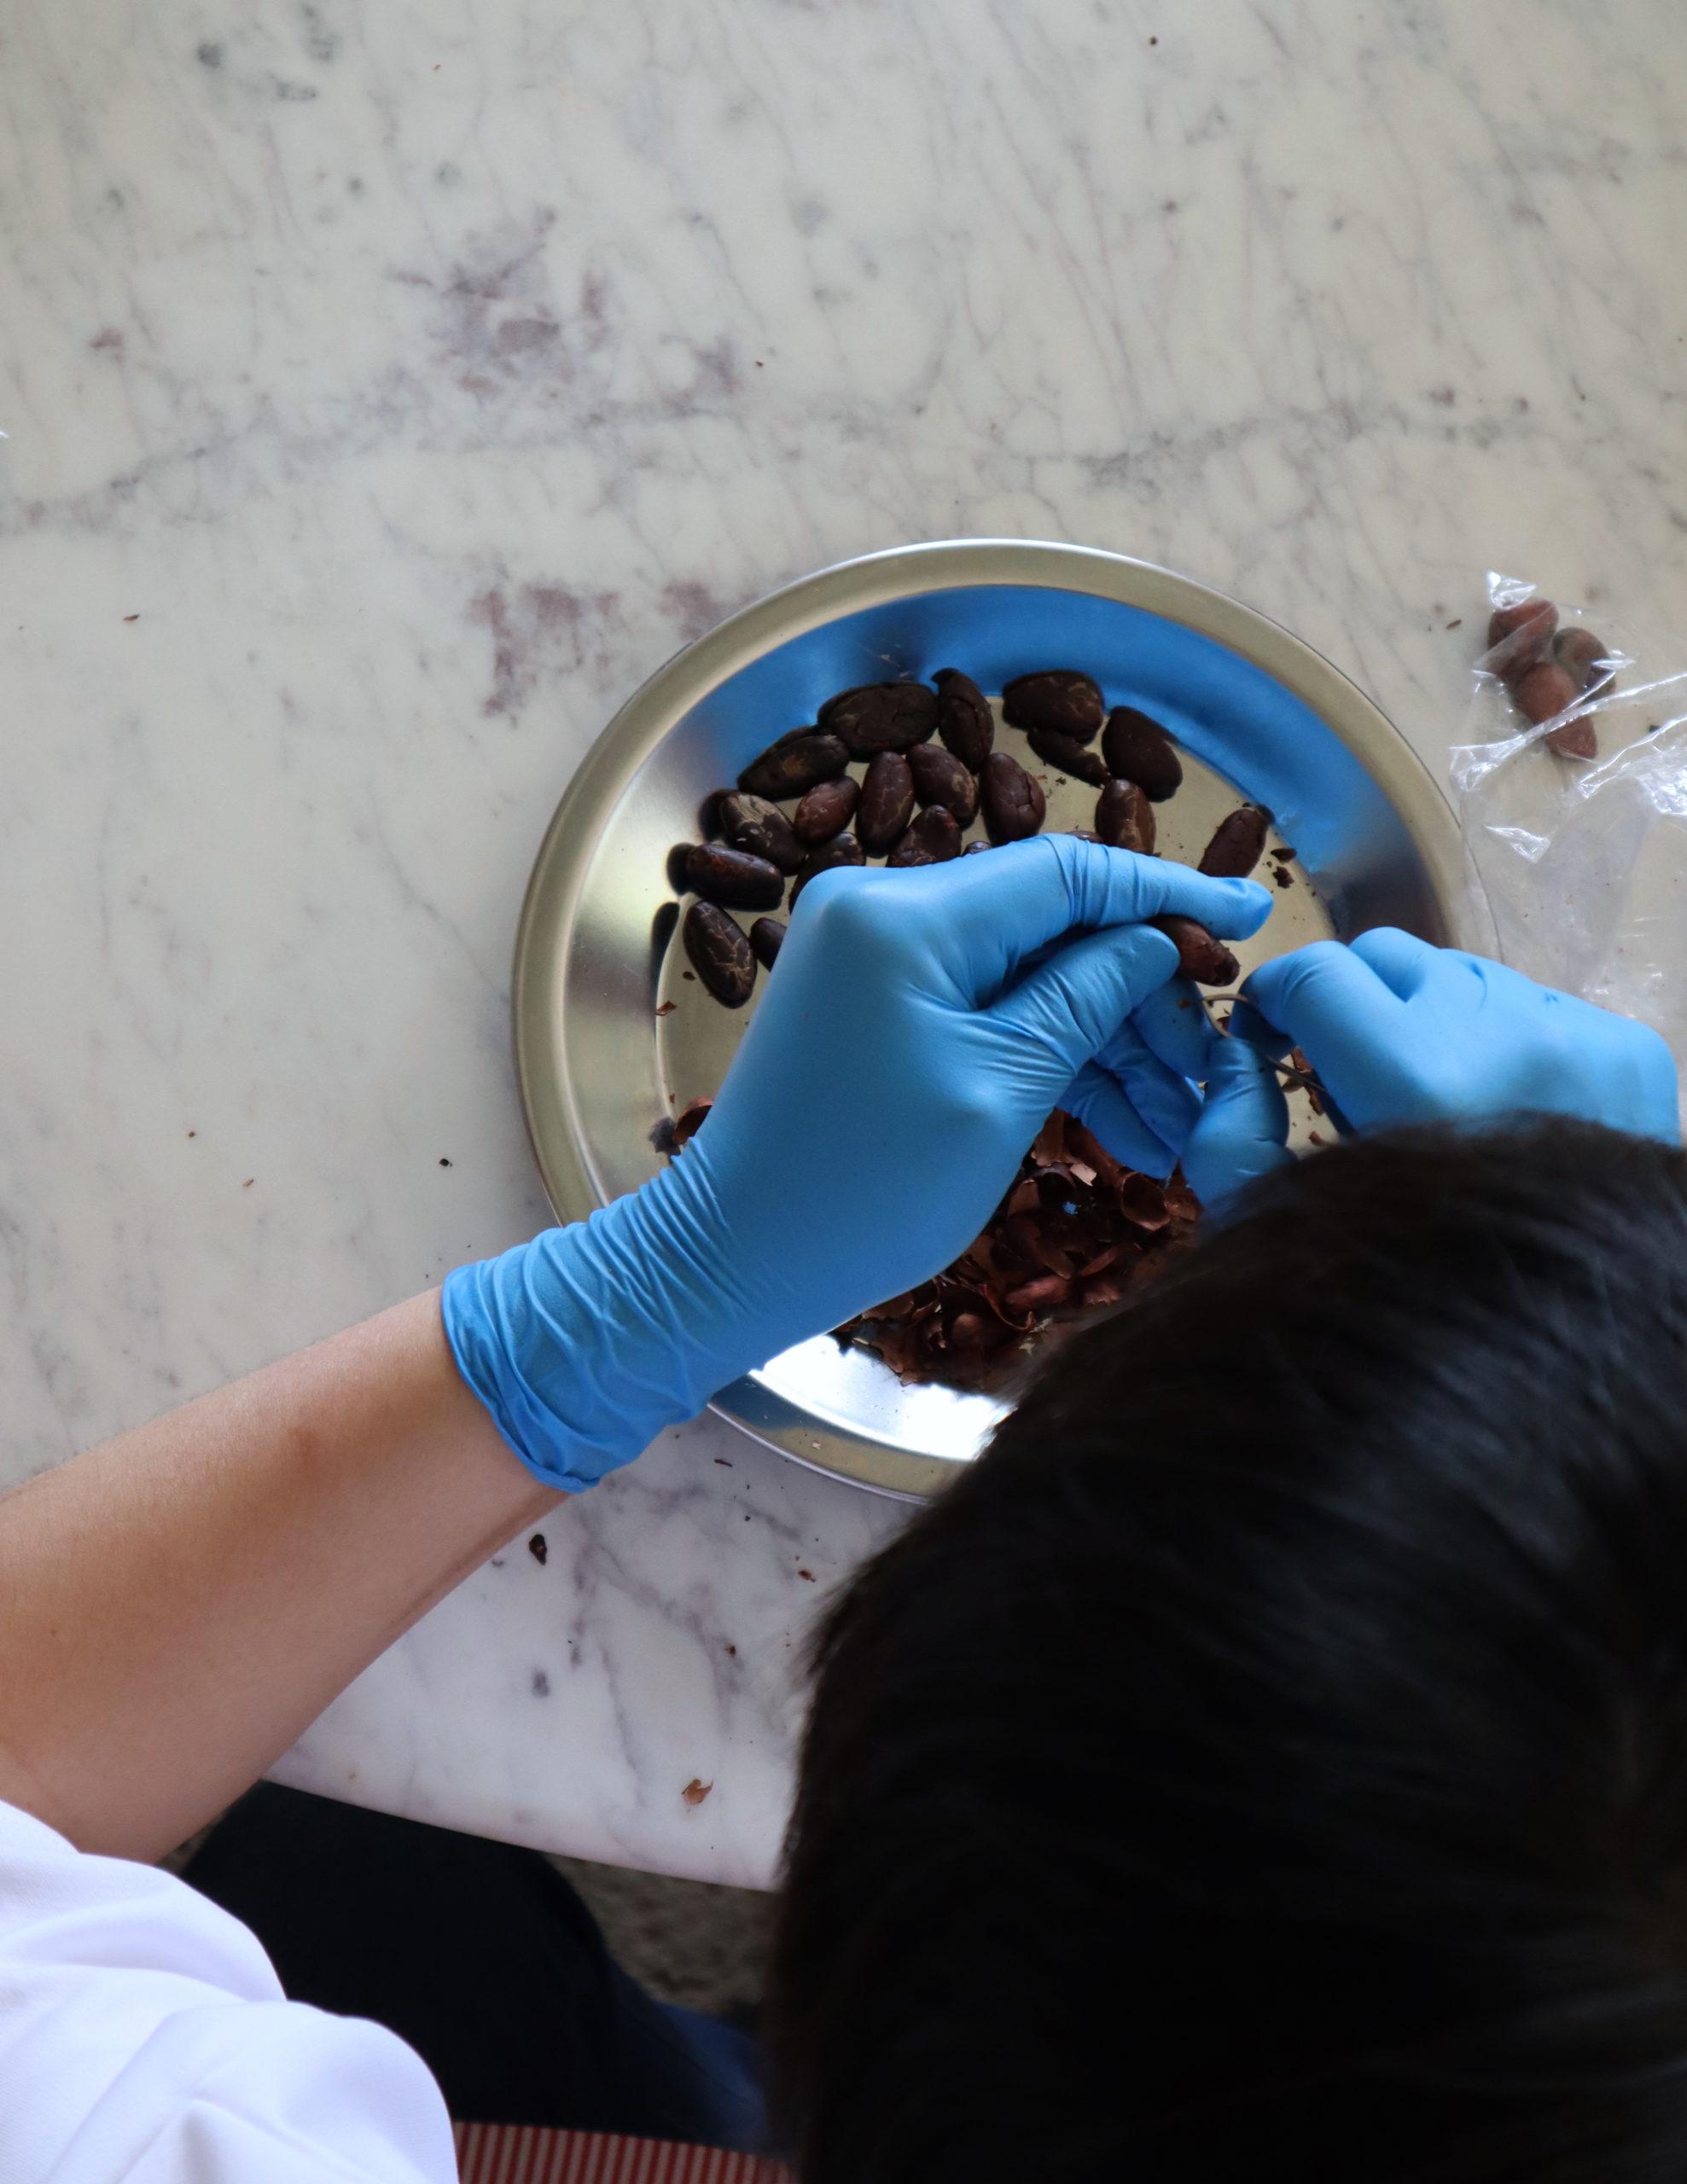 LOG(ログ)と尾道さつき作業所がカカオ豆からの手作りチョコレートワークショップ(2月6日)参加者を募集 テーマはバレンタインギフト